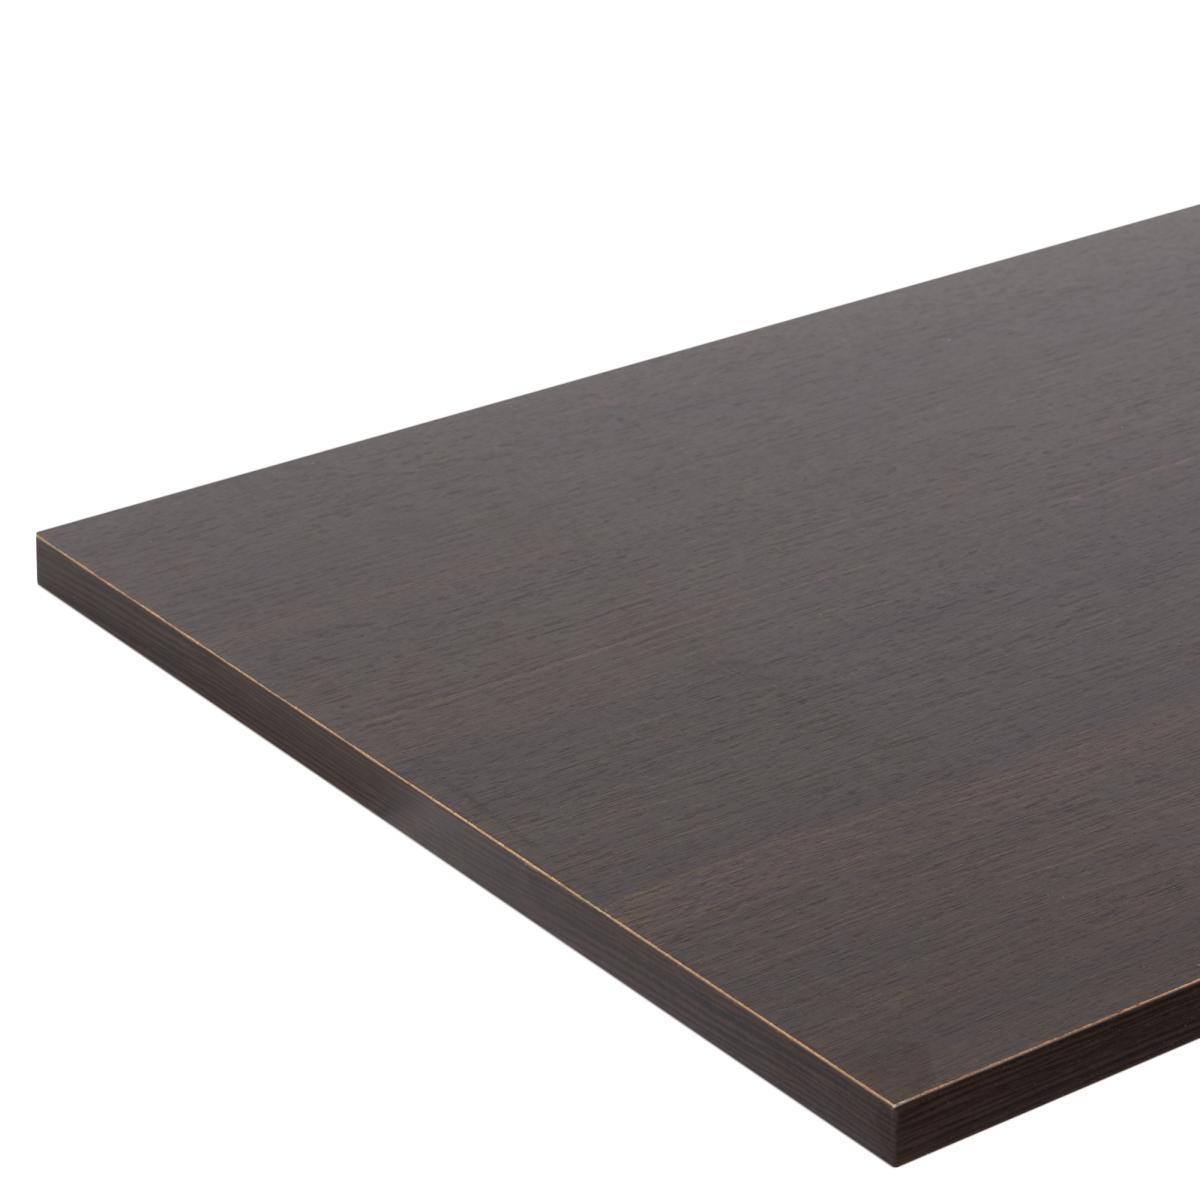 Деталь мебельная 1200x400x16 мм ЛДСП дуб термо темный кромка со всех сторон